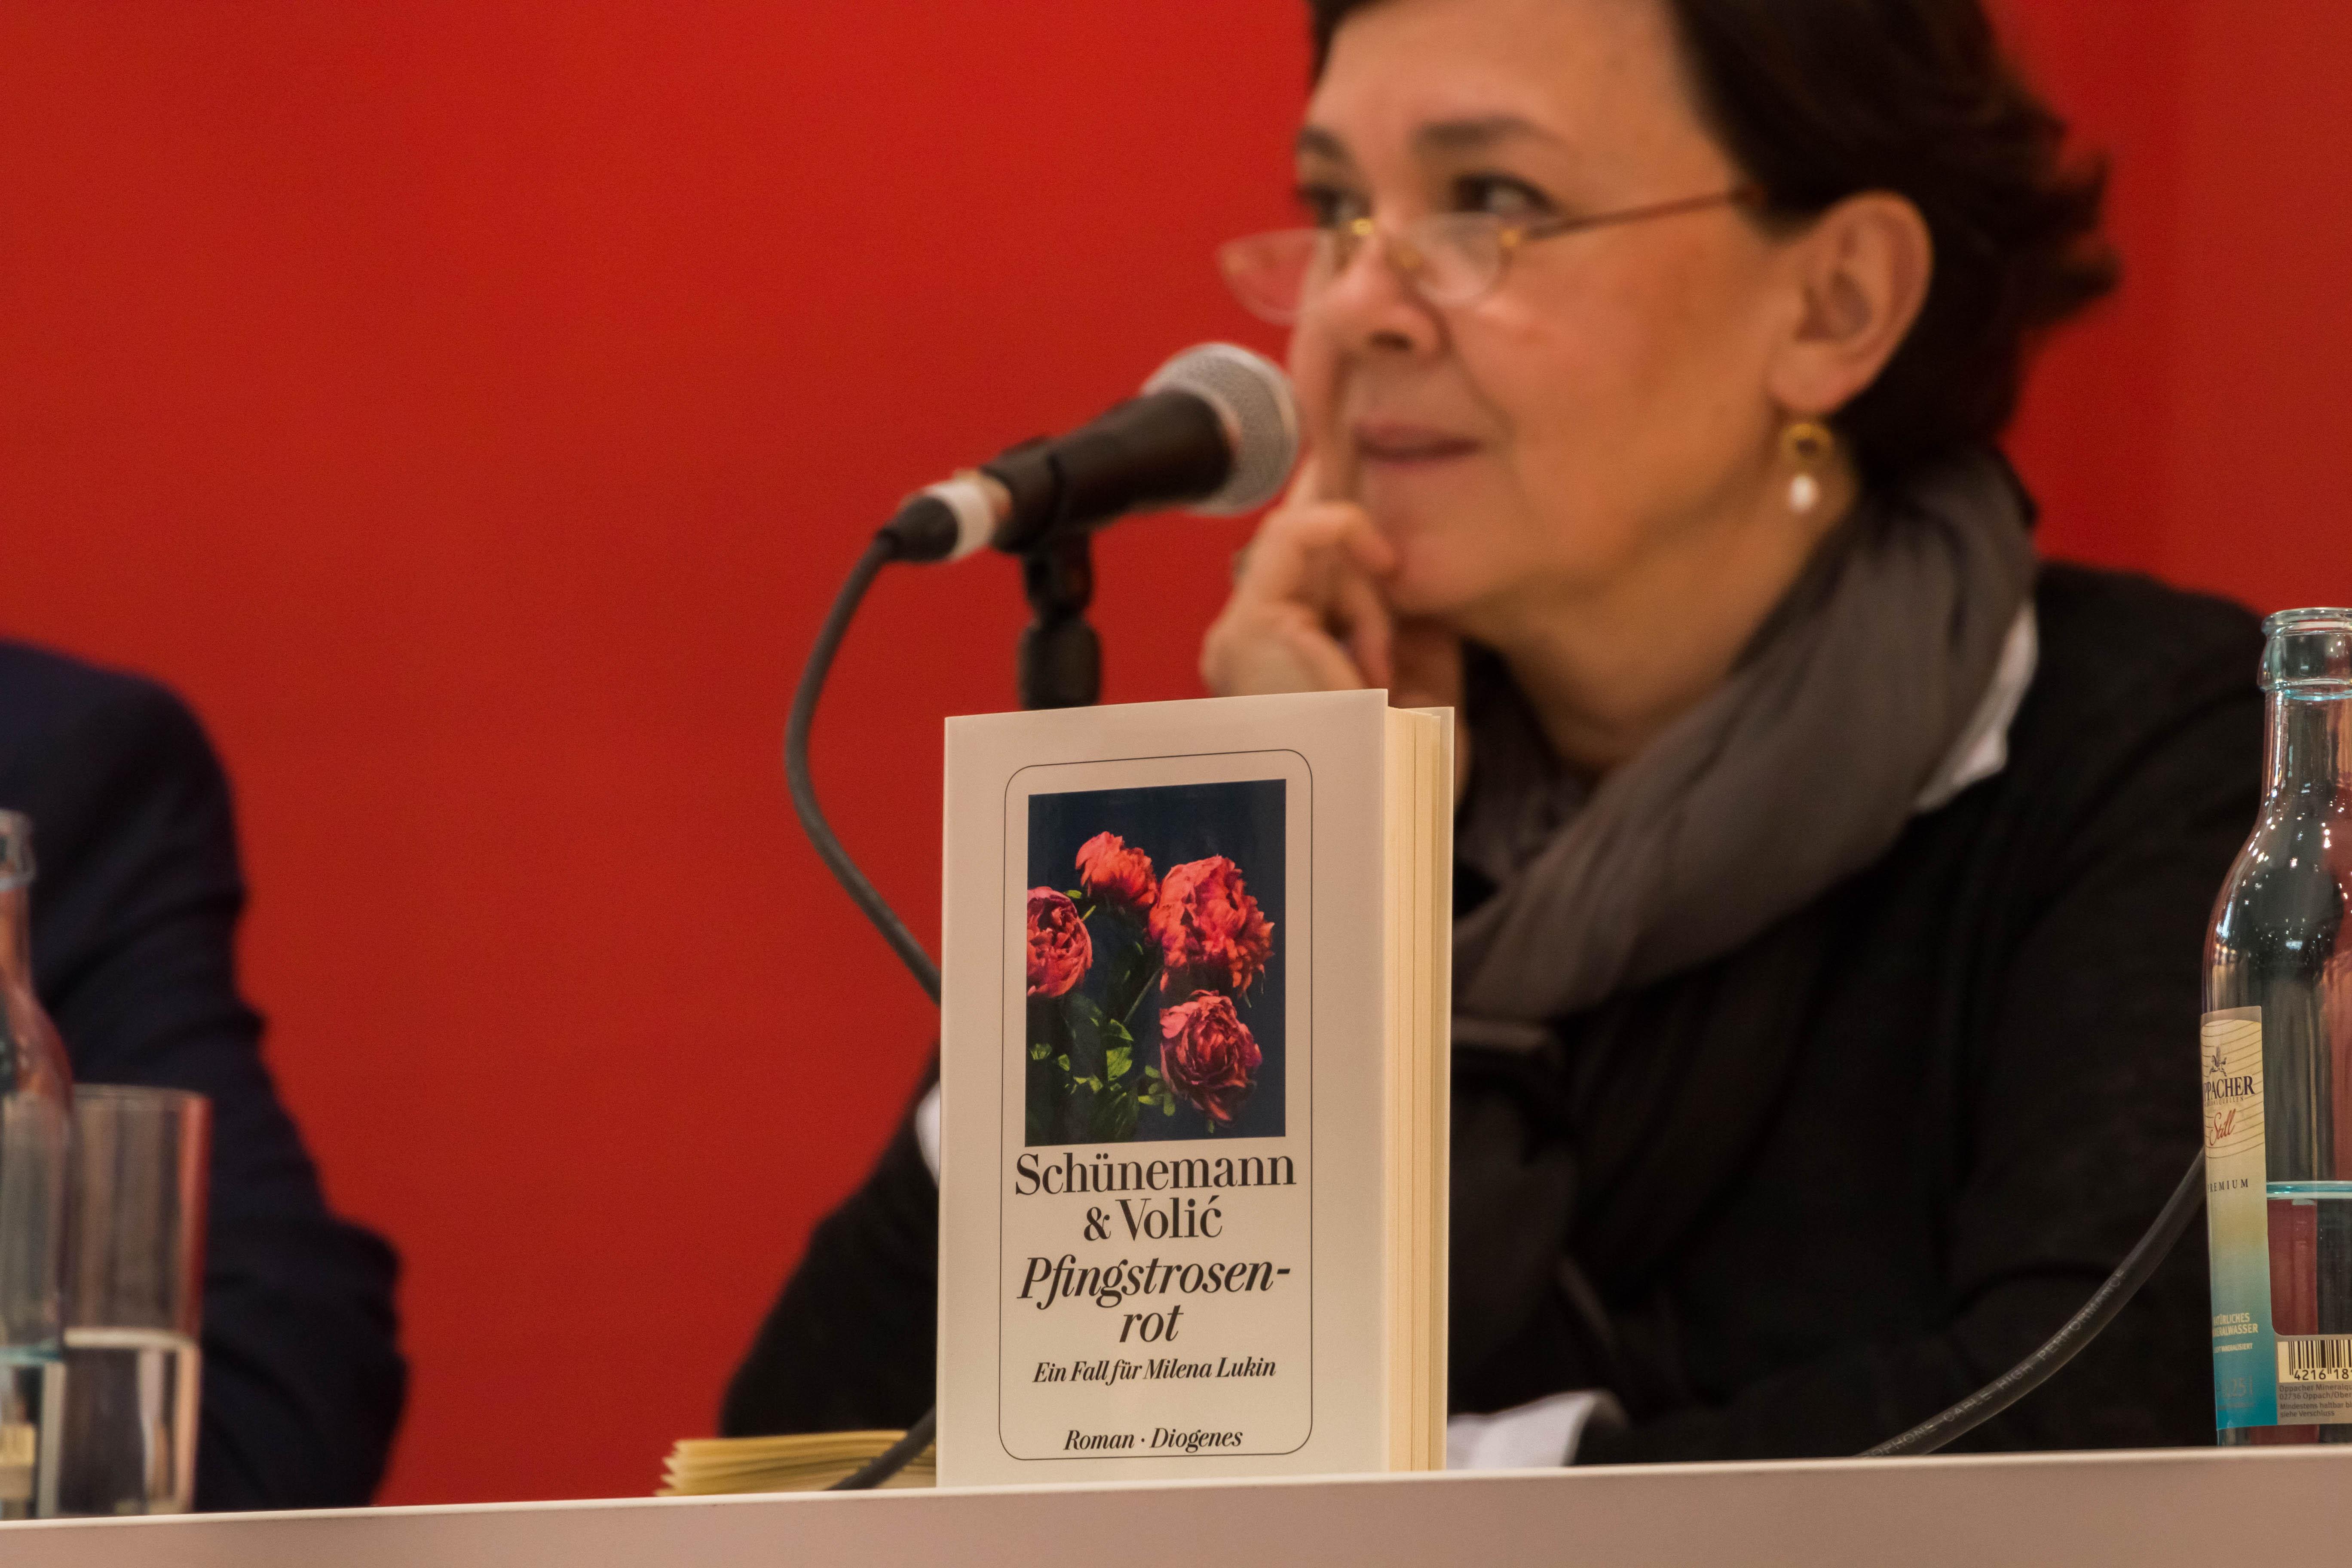 Der neue Roman »Pfingstrosenrot«, im Hintergrund Jelena Volić. © Tobias Polze, www.facebook.de/digitalfototobi